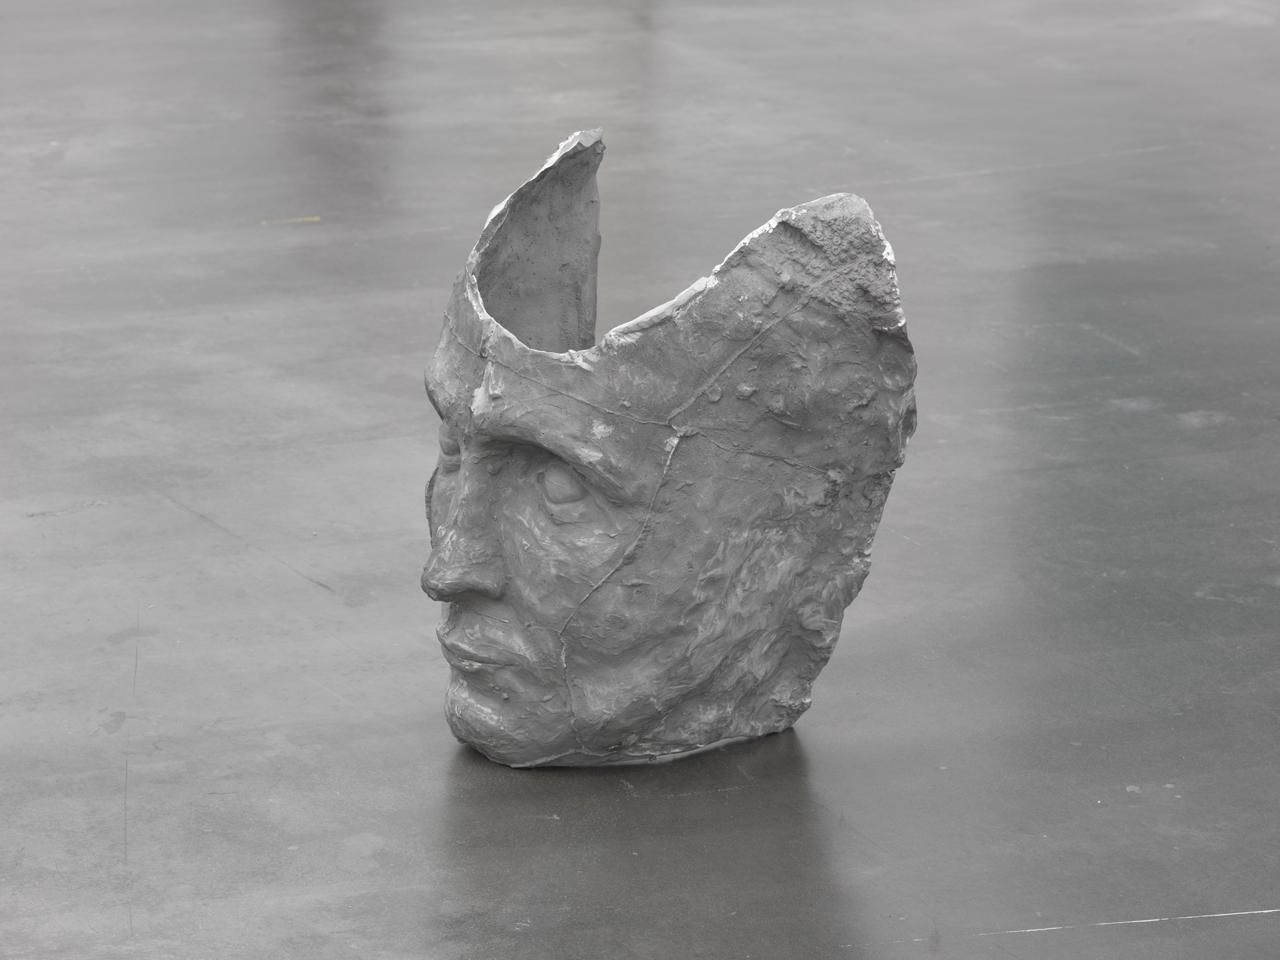 Crome 2015 aluminium cast 62 x 60 x 38 cm courtesy Berthold Pott, cologne